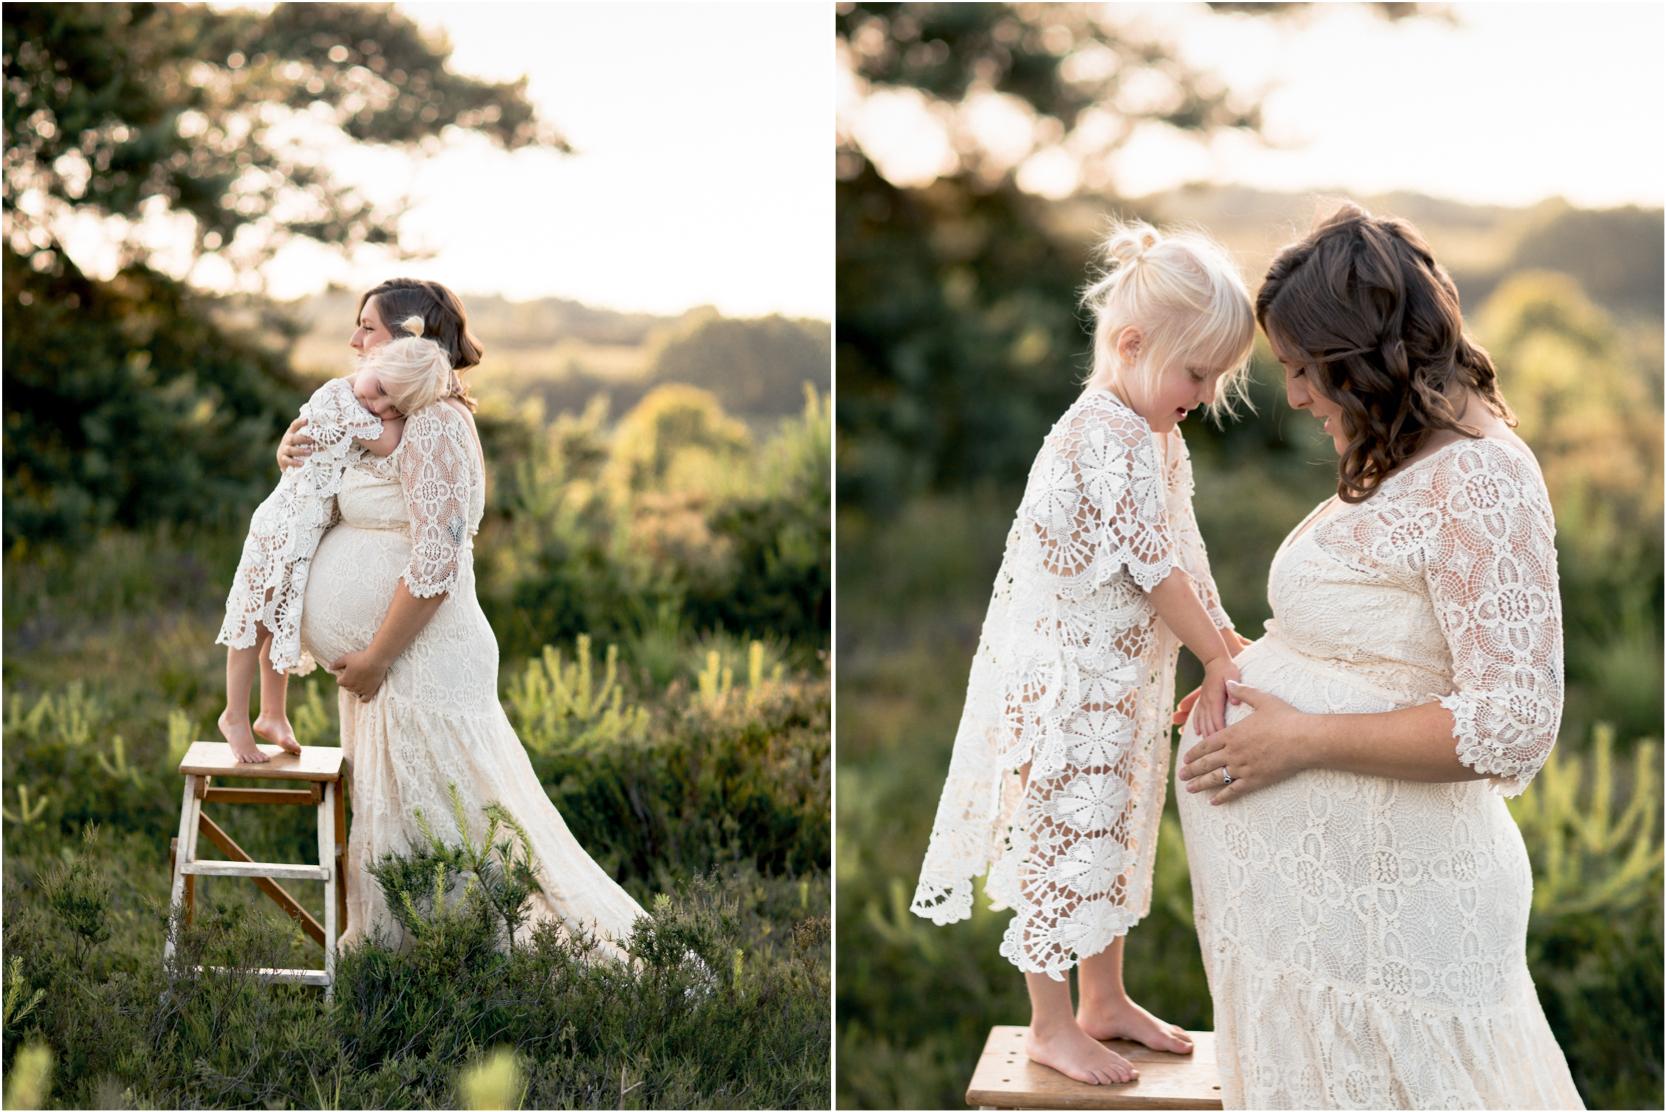 Rebecca Searle Photography Maternity Photography 3.jpg